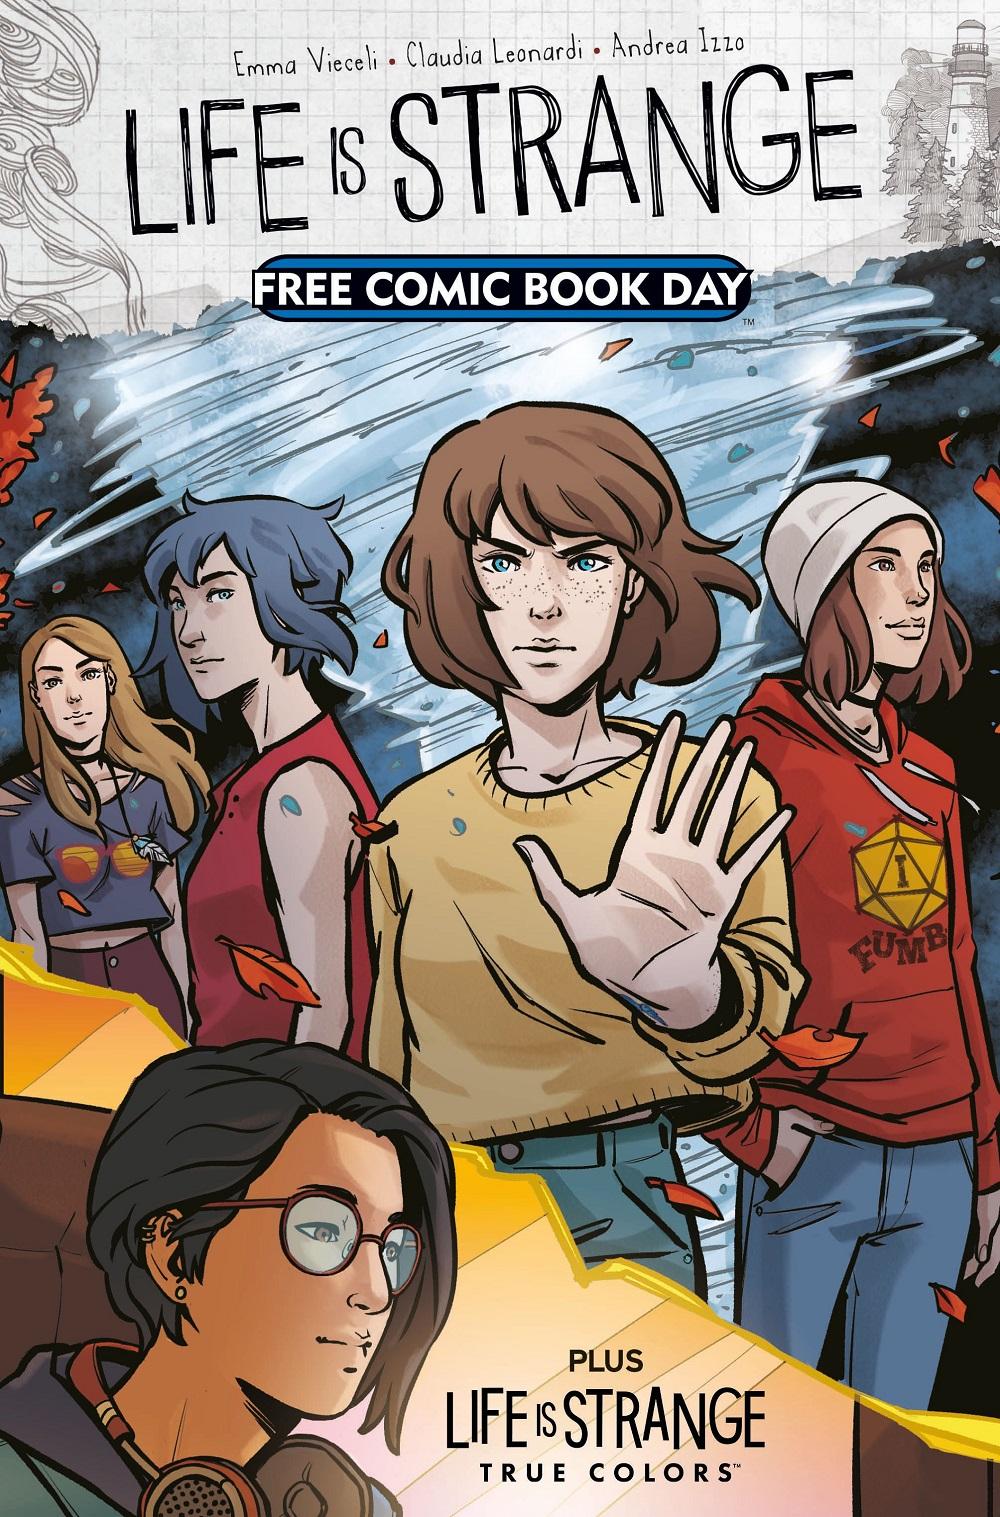 FFv8cdjg Titan Comics reveals cover and story for Life Is Strange FCBD 2021